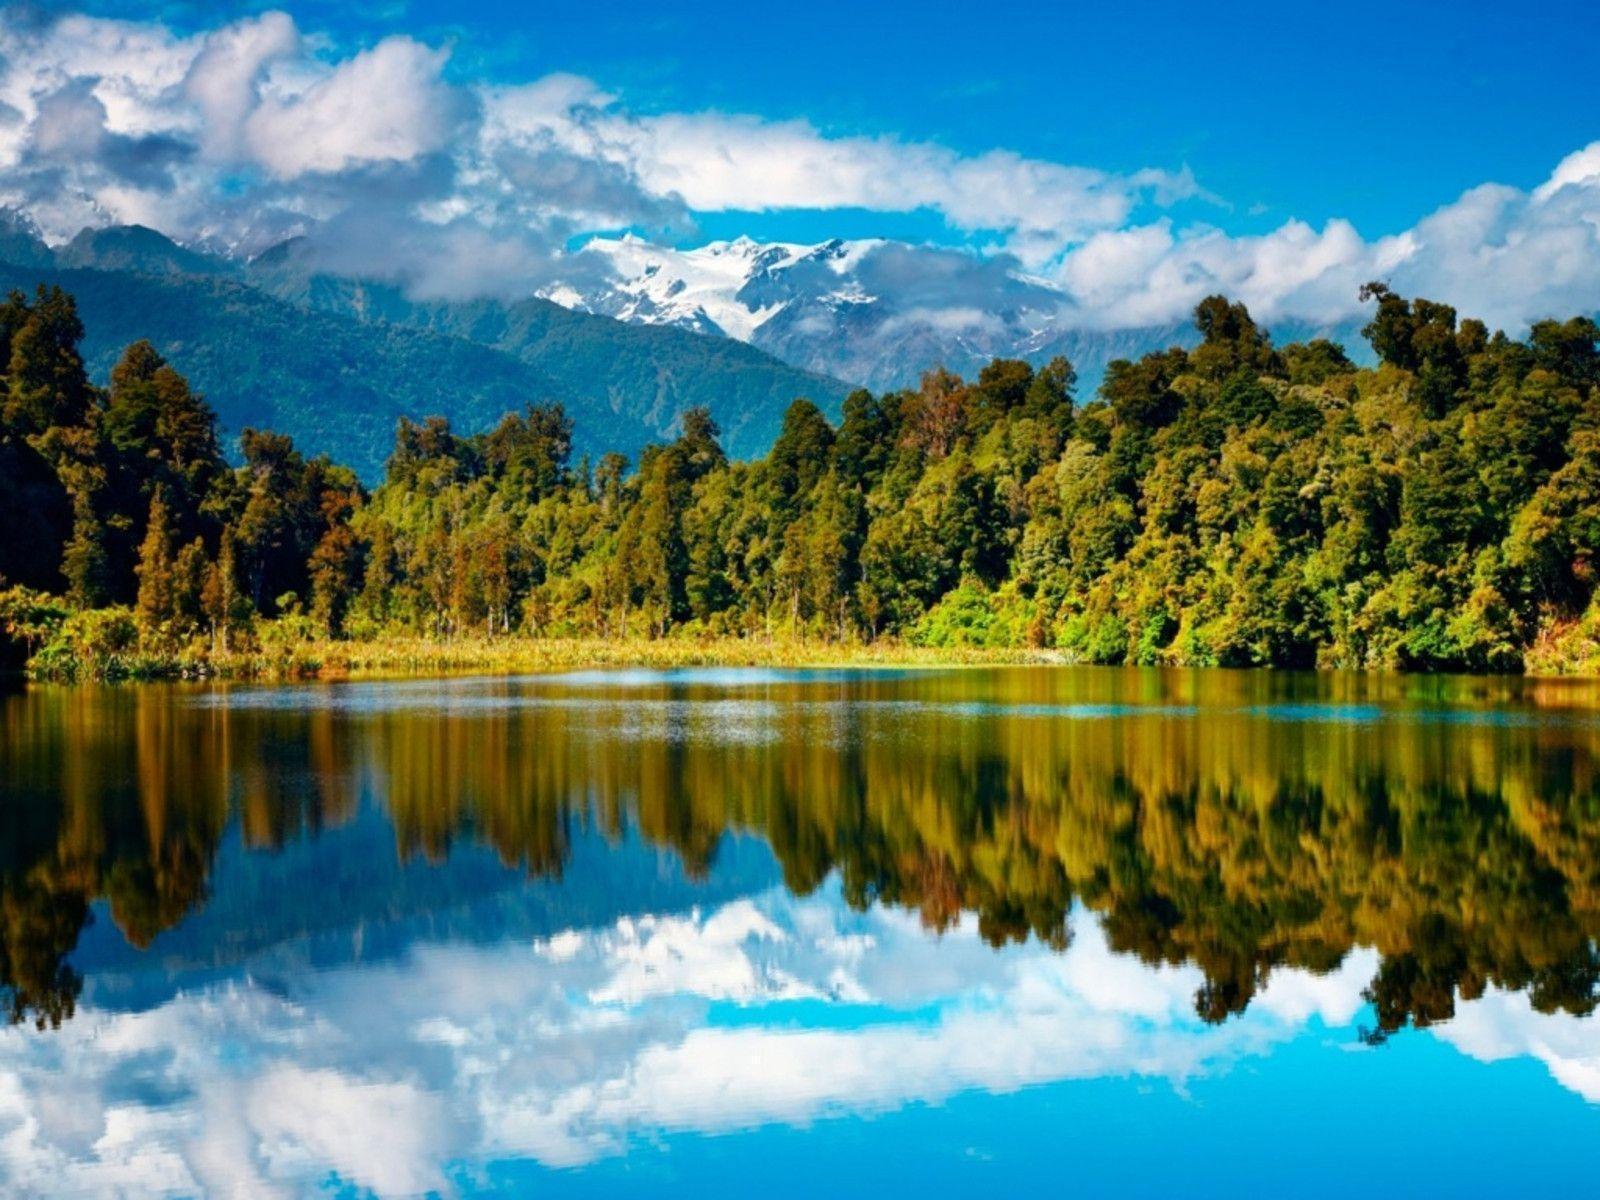 Cool And Beautiful Nature Desktop Wallpaper Image: Beautiful Nature Backgrounds